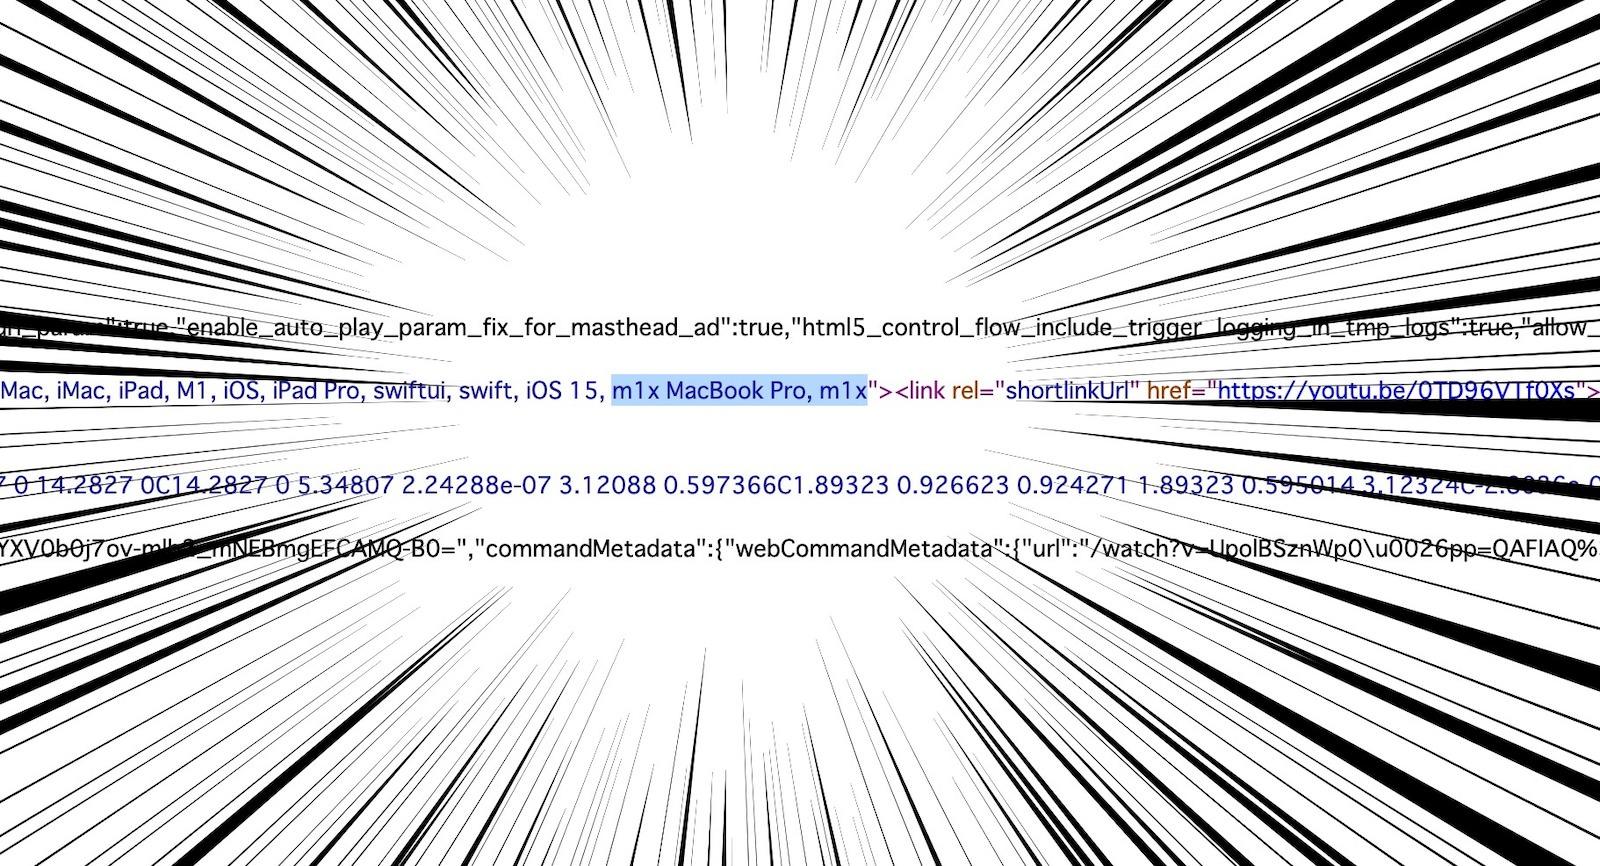 M1x tag found on wwdc youtube